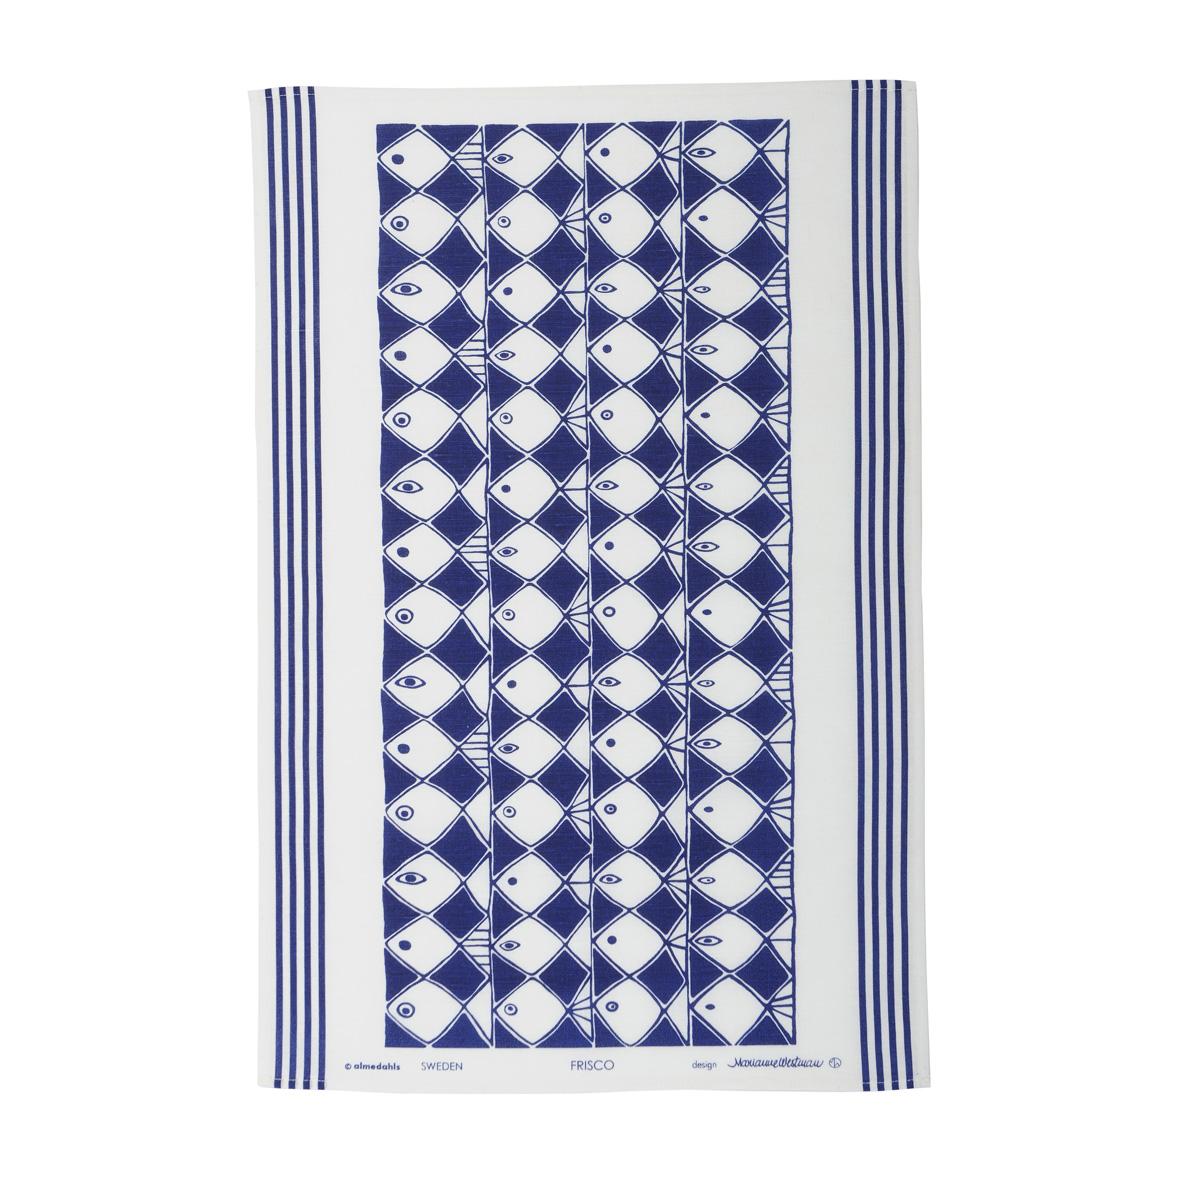 Almedahls  Textil  Frisco  K?kshandduk  Bothnia Antik & Mod?rn